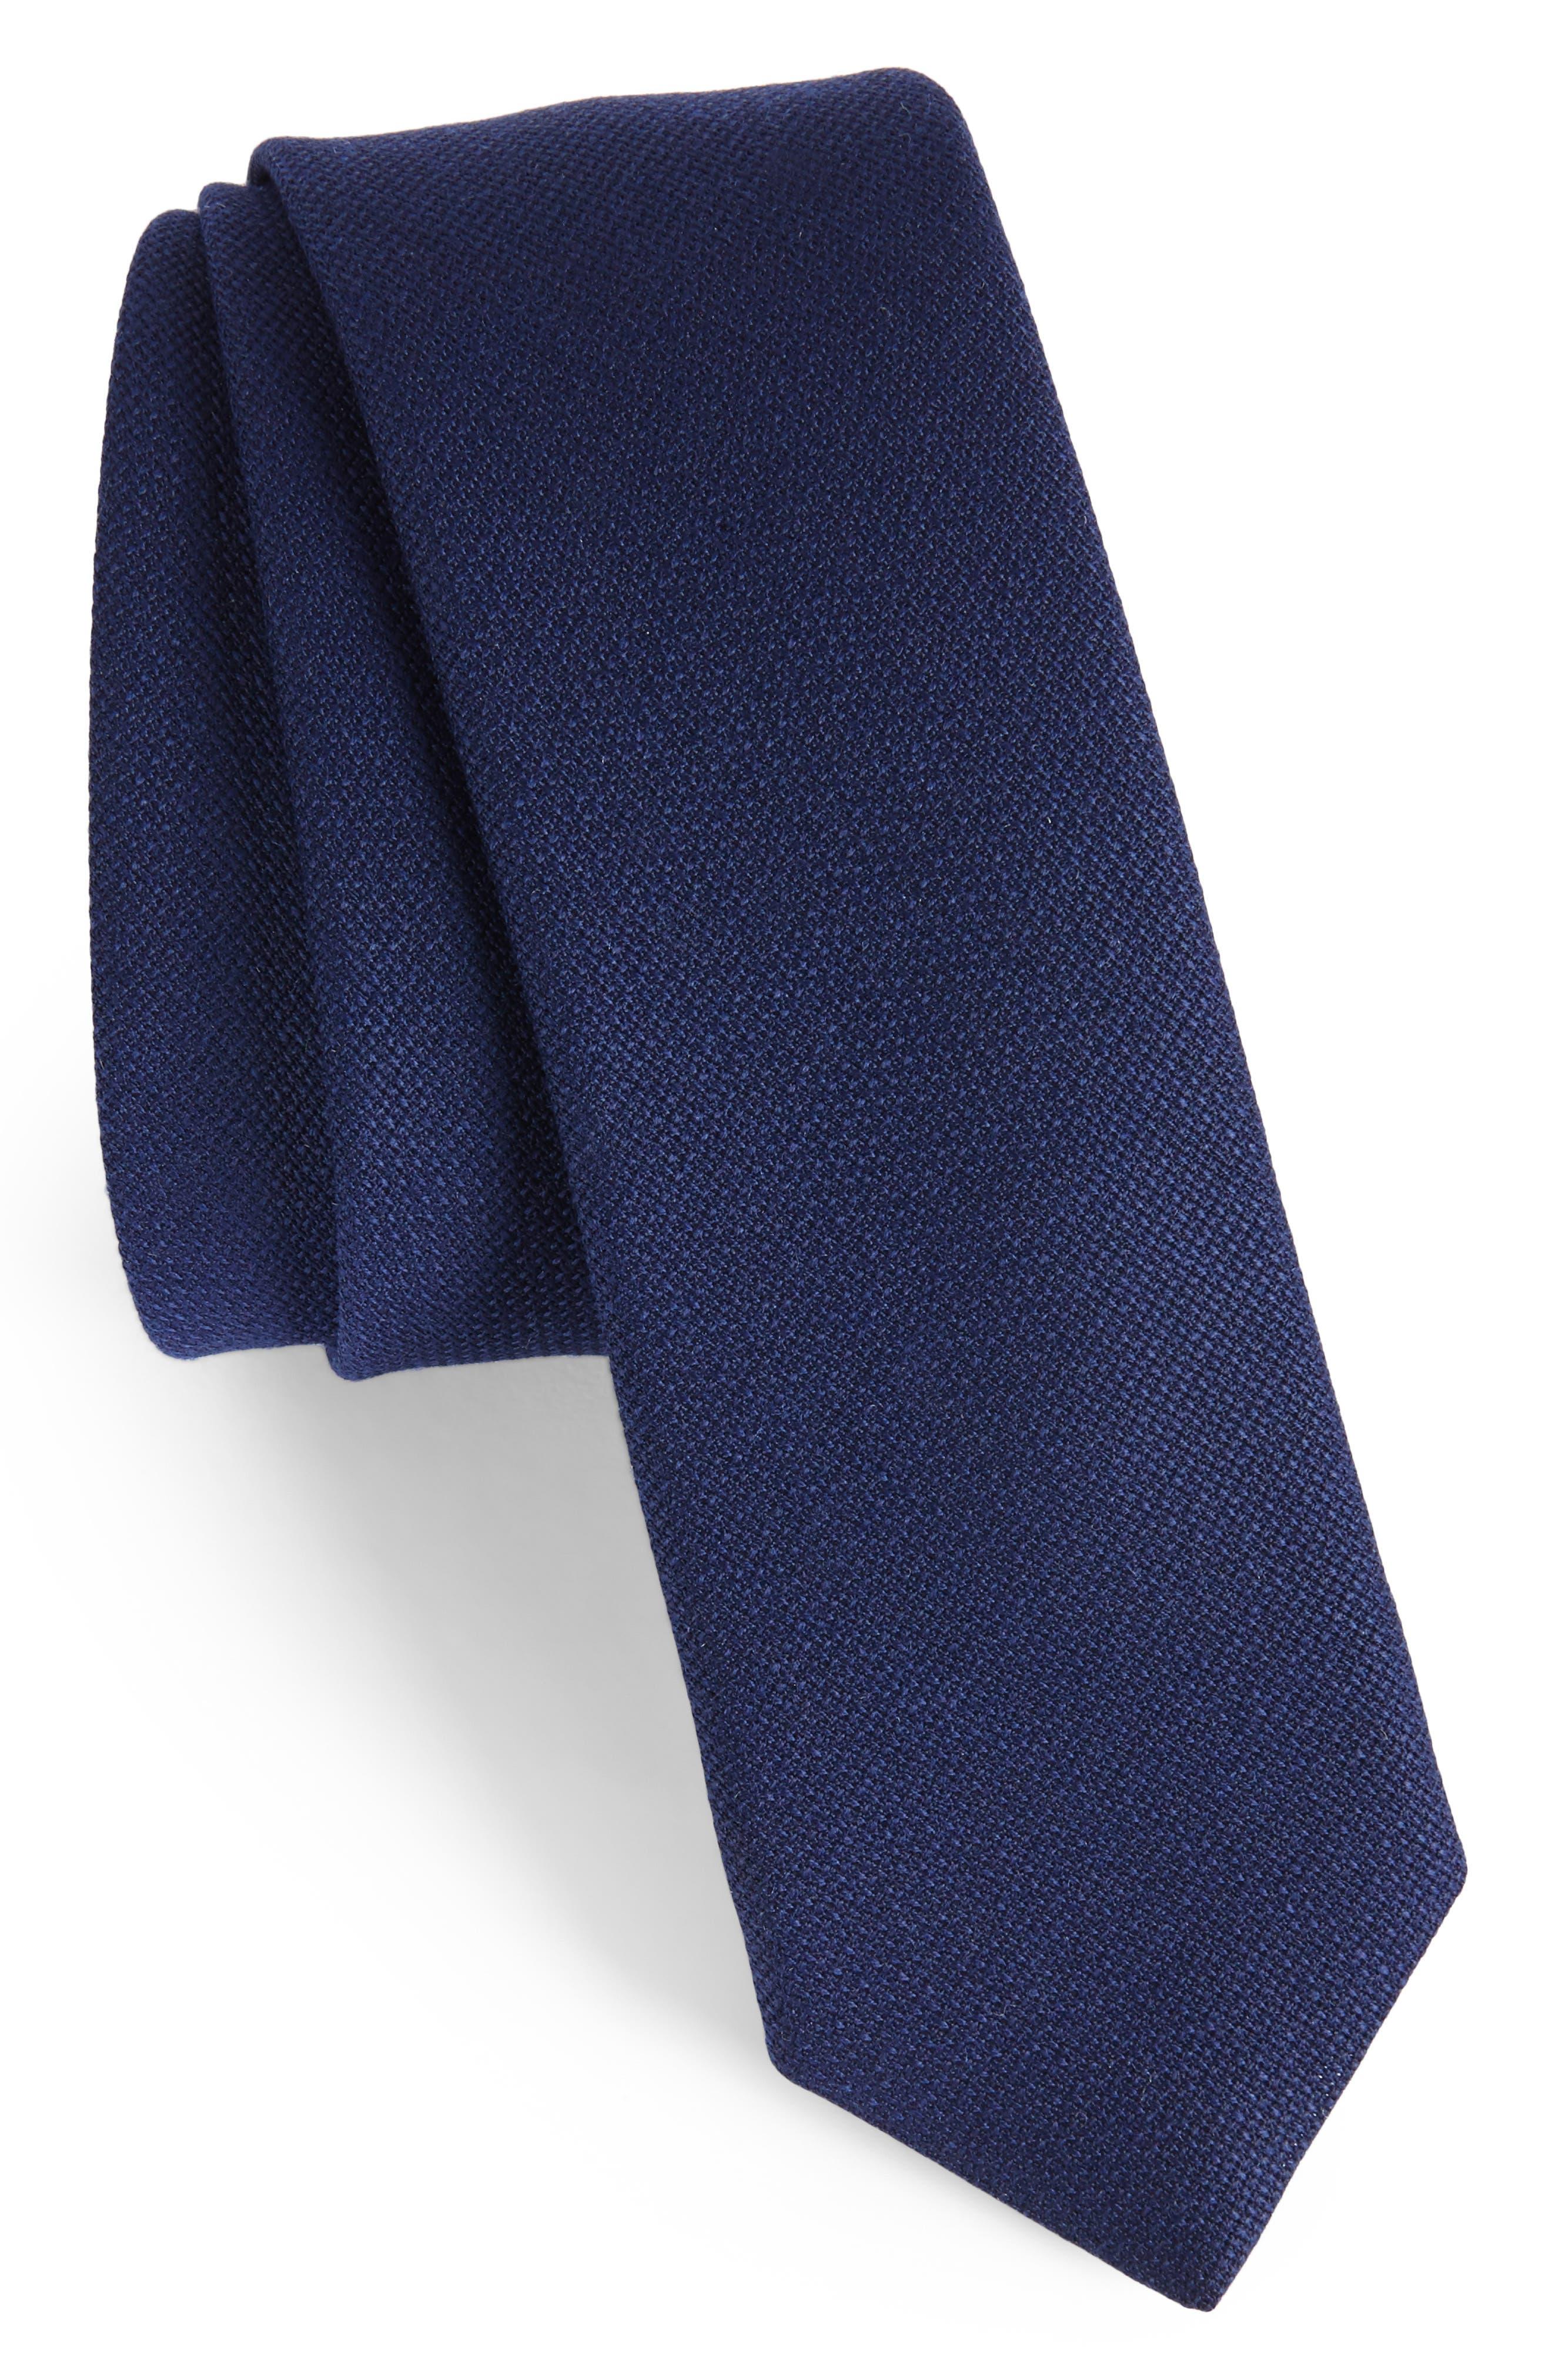 Main Image - Eleventy Marled Wool Skinny Tie